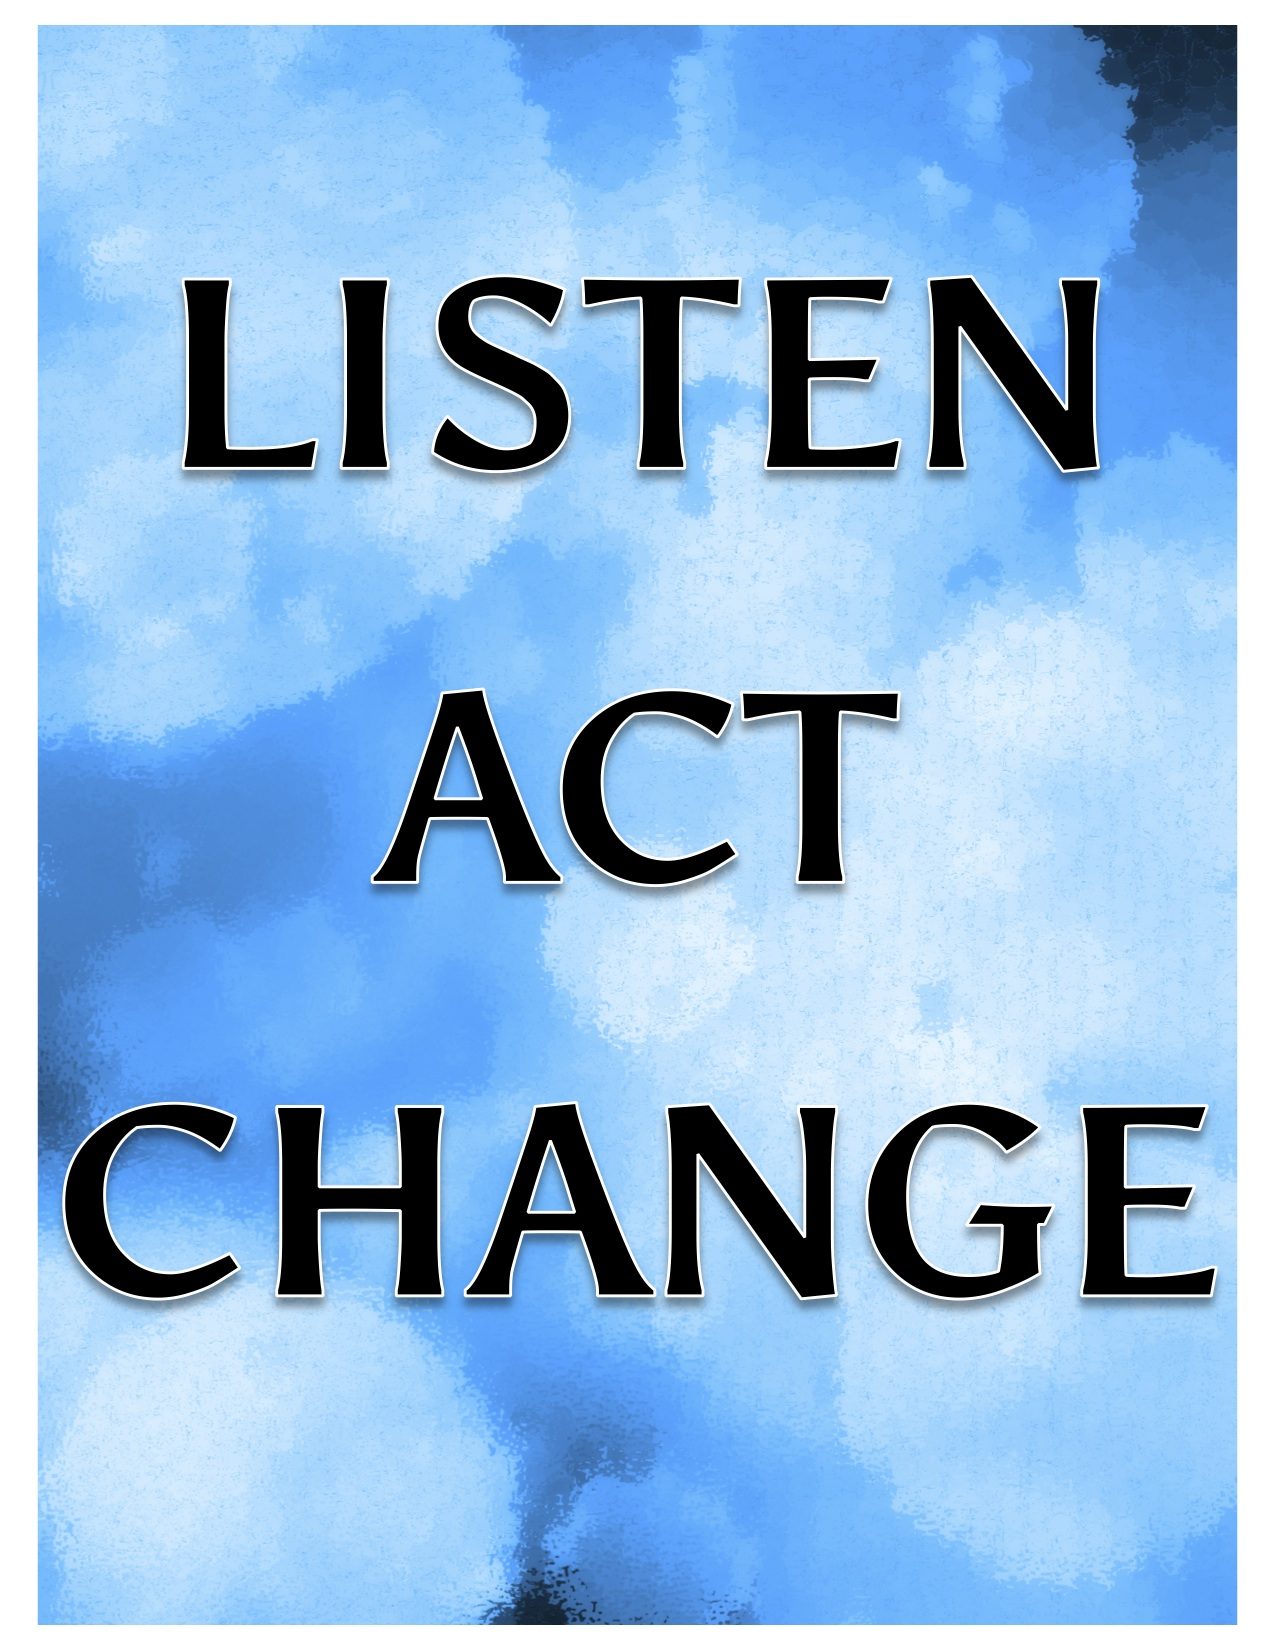 ListenActChangepic.jpg